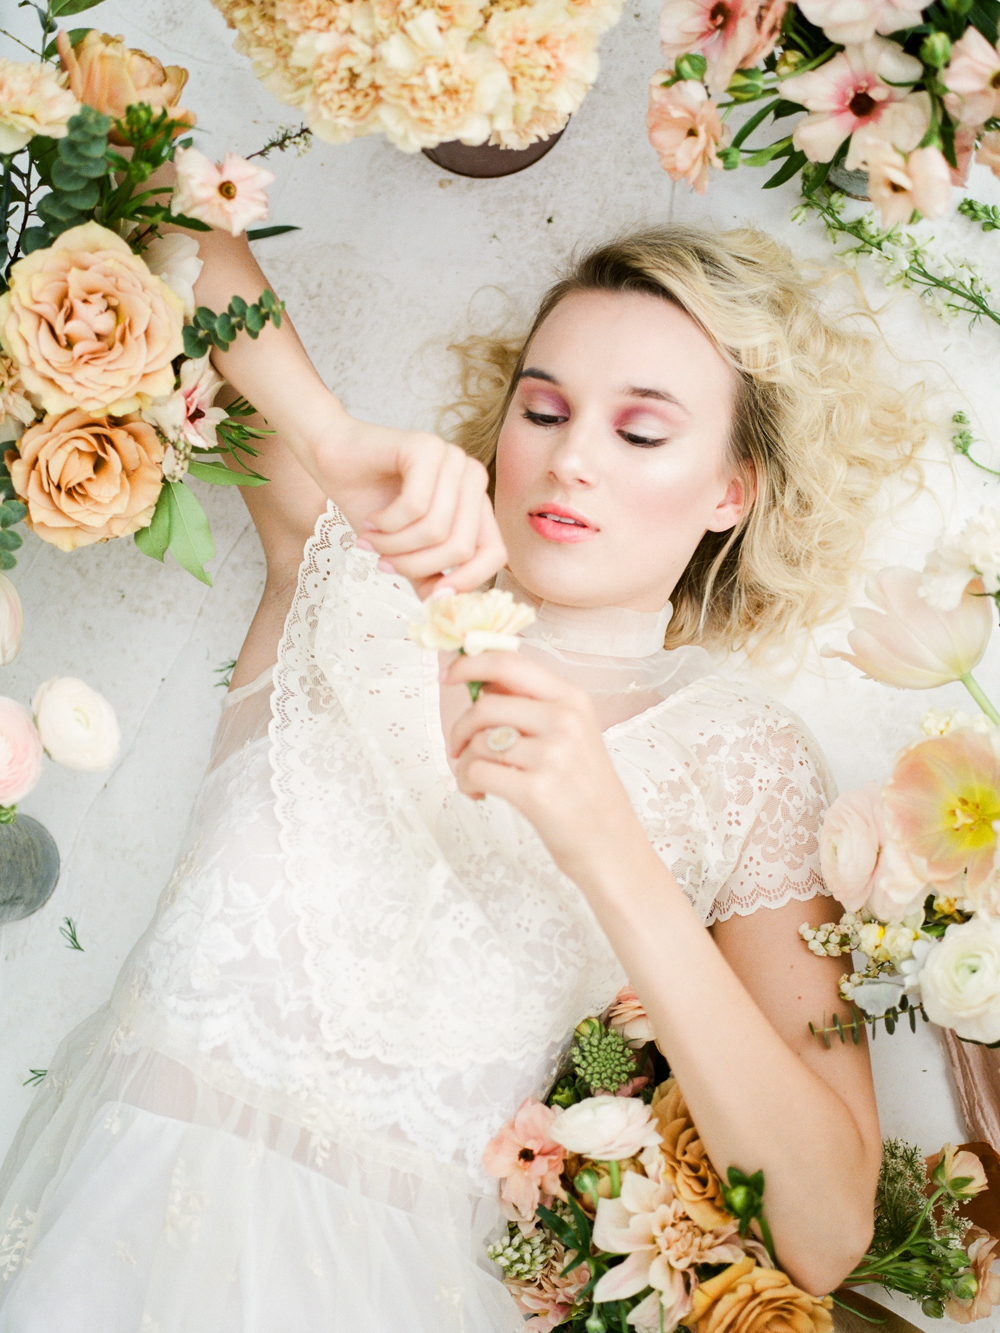 Christine Gosch - destination film photographer - houston wedding photographer - fine art film photographer - elopement photographer - destination wedding - understated wedding - simple beautiful wedding photography-126.jpg